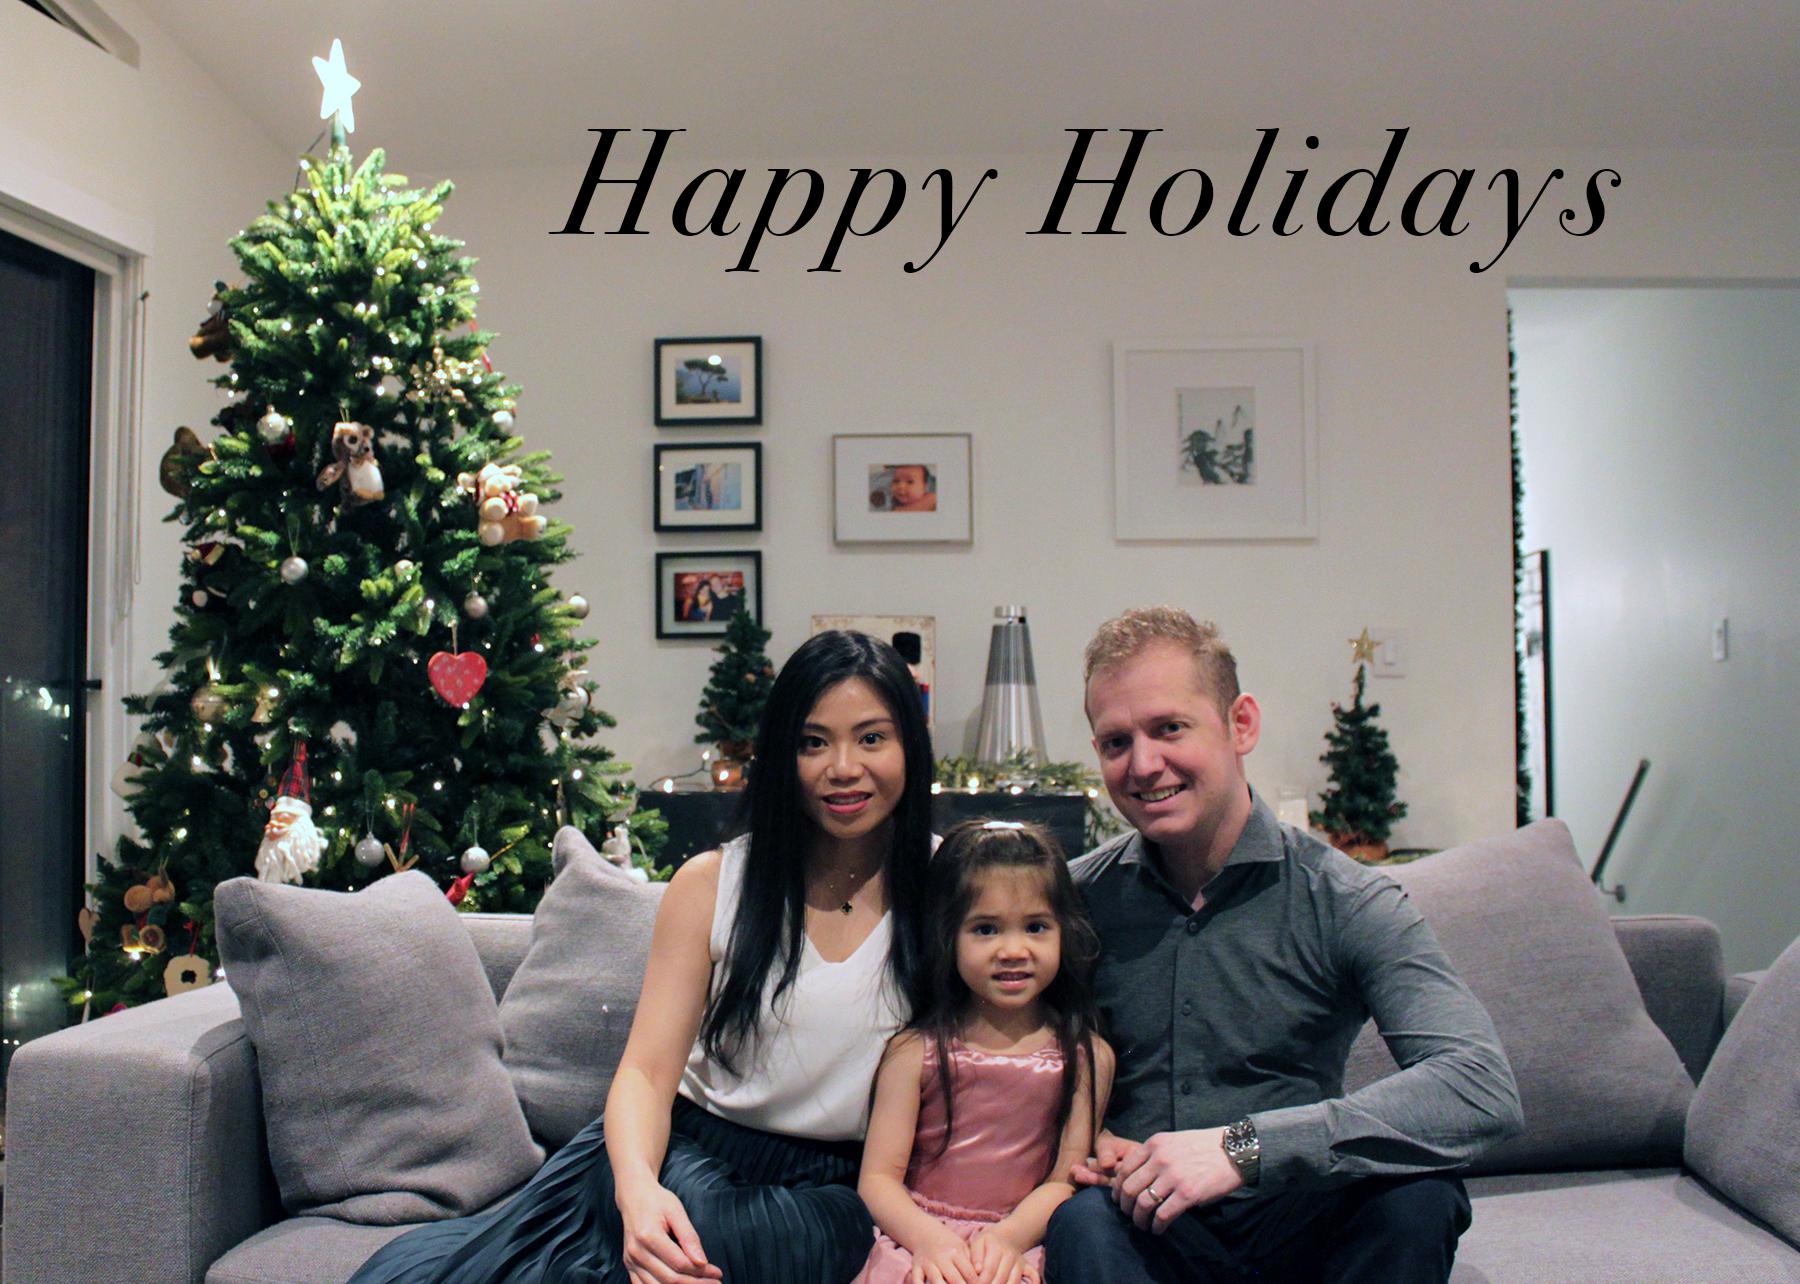 happy holidays from Paul Albrighton's family